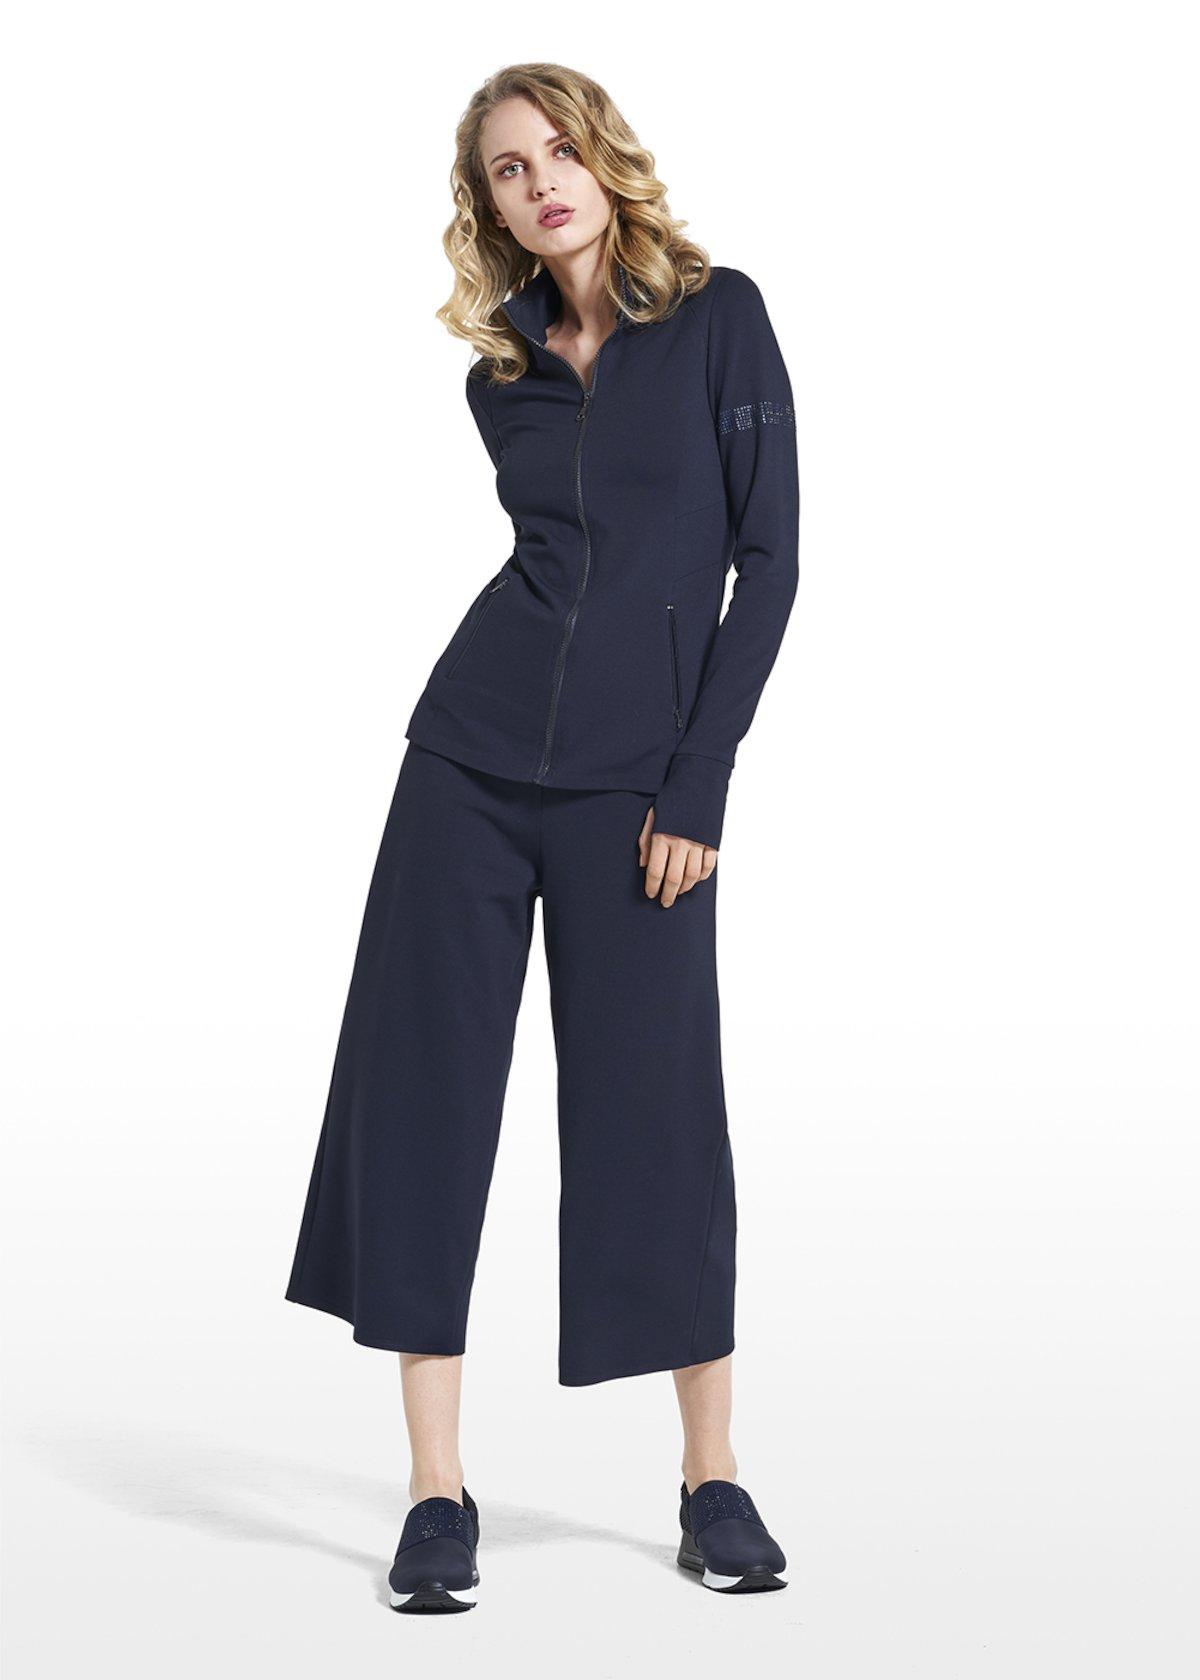 Sweatshirt Fiona in Punto Milano fabric - Dark Blue - Woman